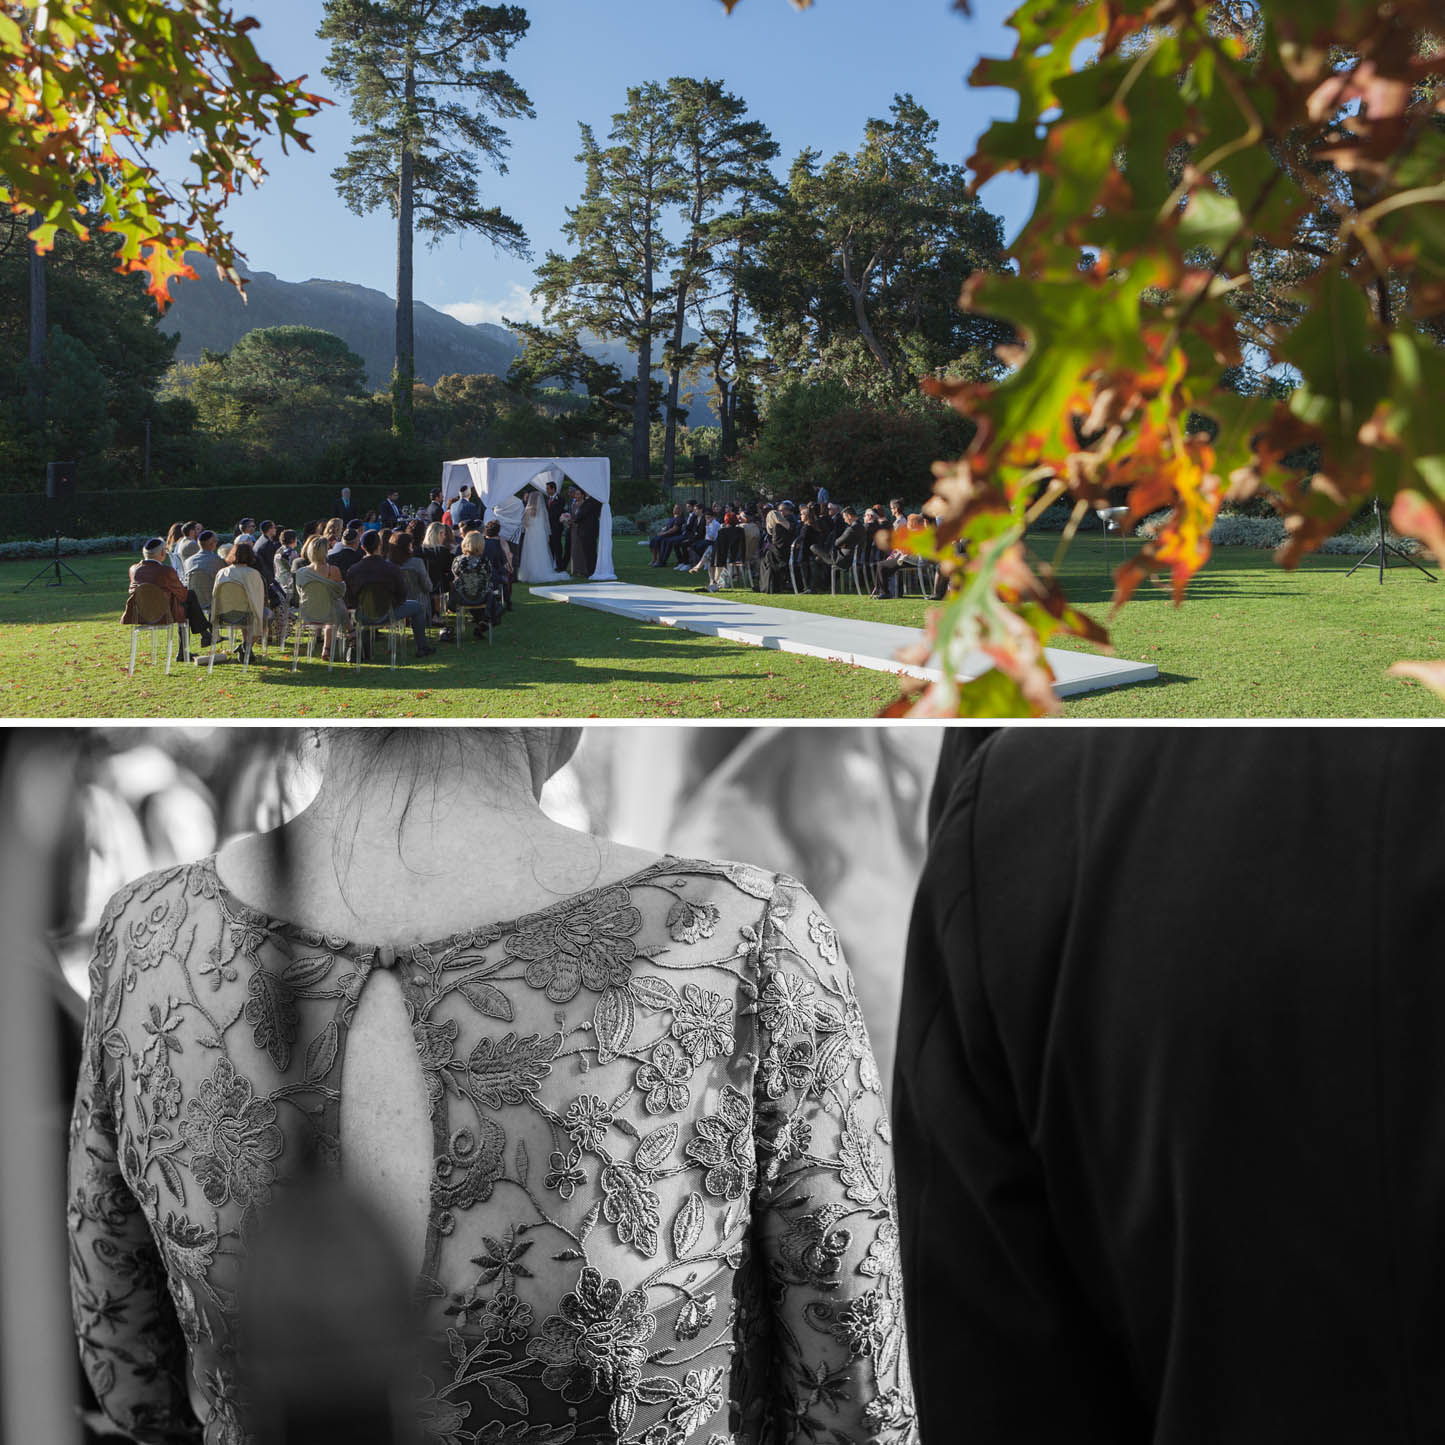 Leon_&_Martine's_Wedding_Photographs_17th_April_2019_@johnhenryweddingphoto_Low_Resolution_Web-304-1.jpg